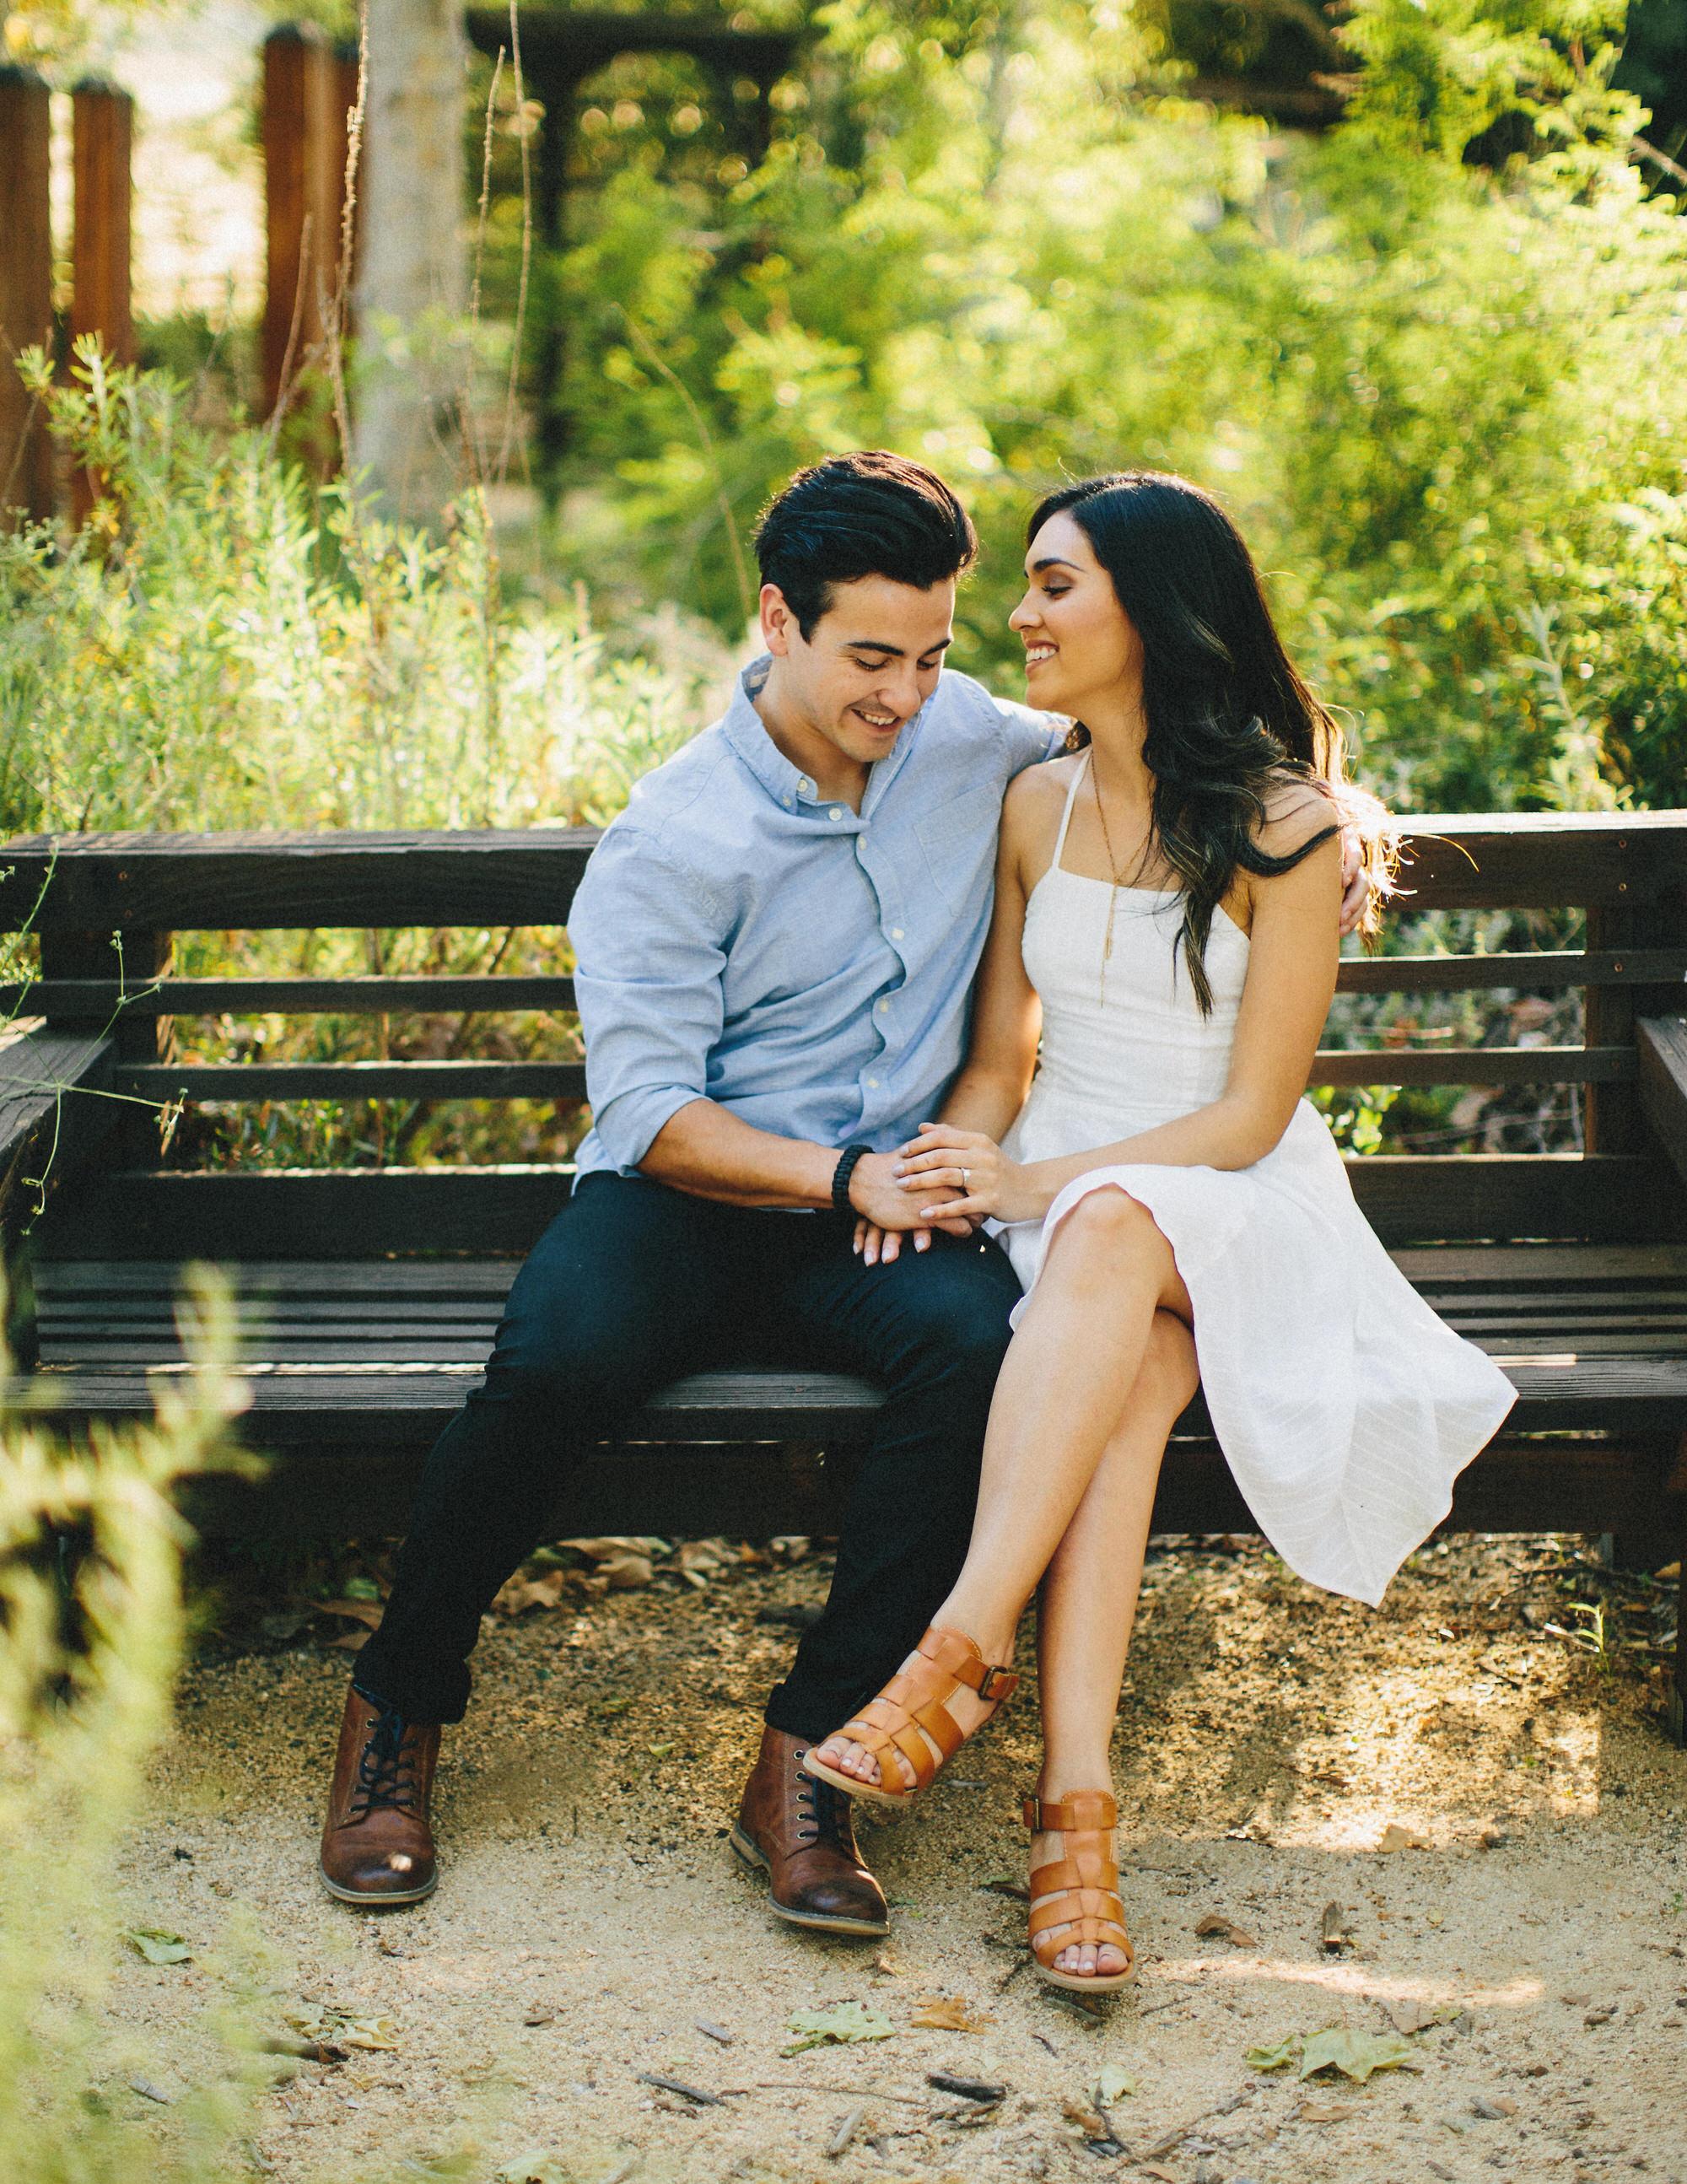 romantic-engagement-13.jpg